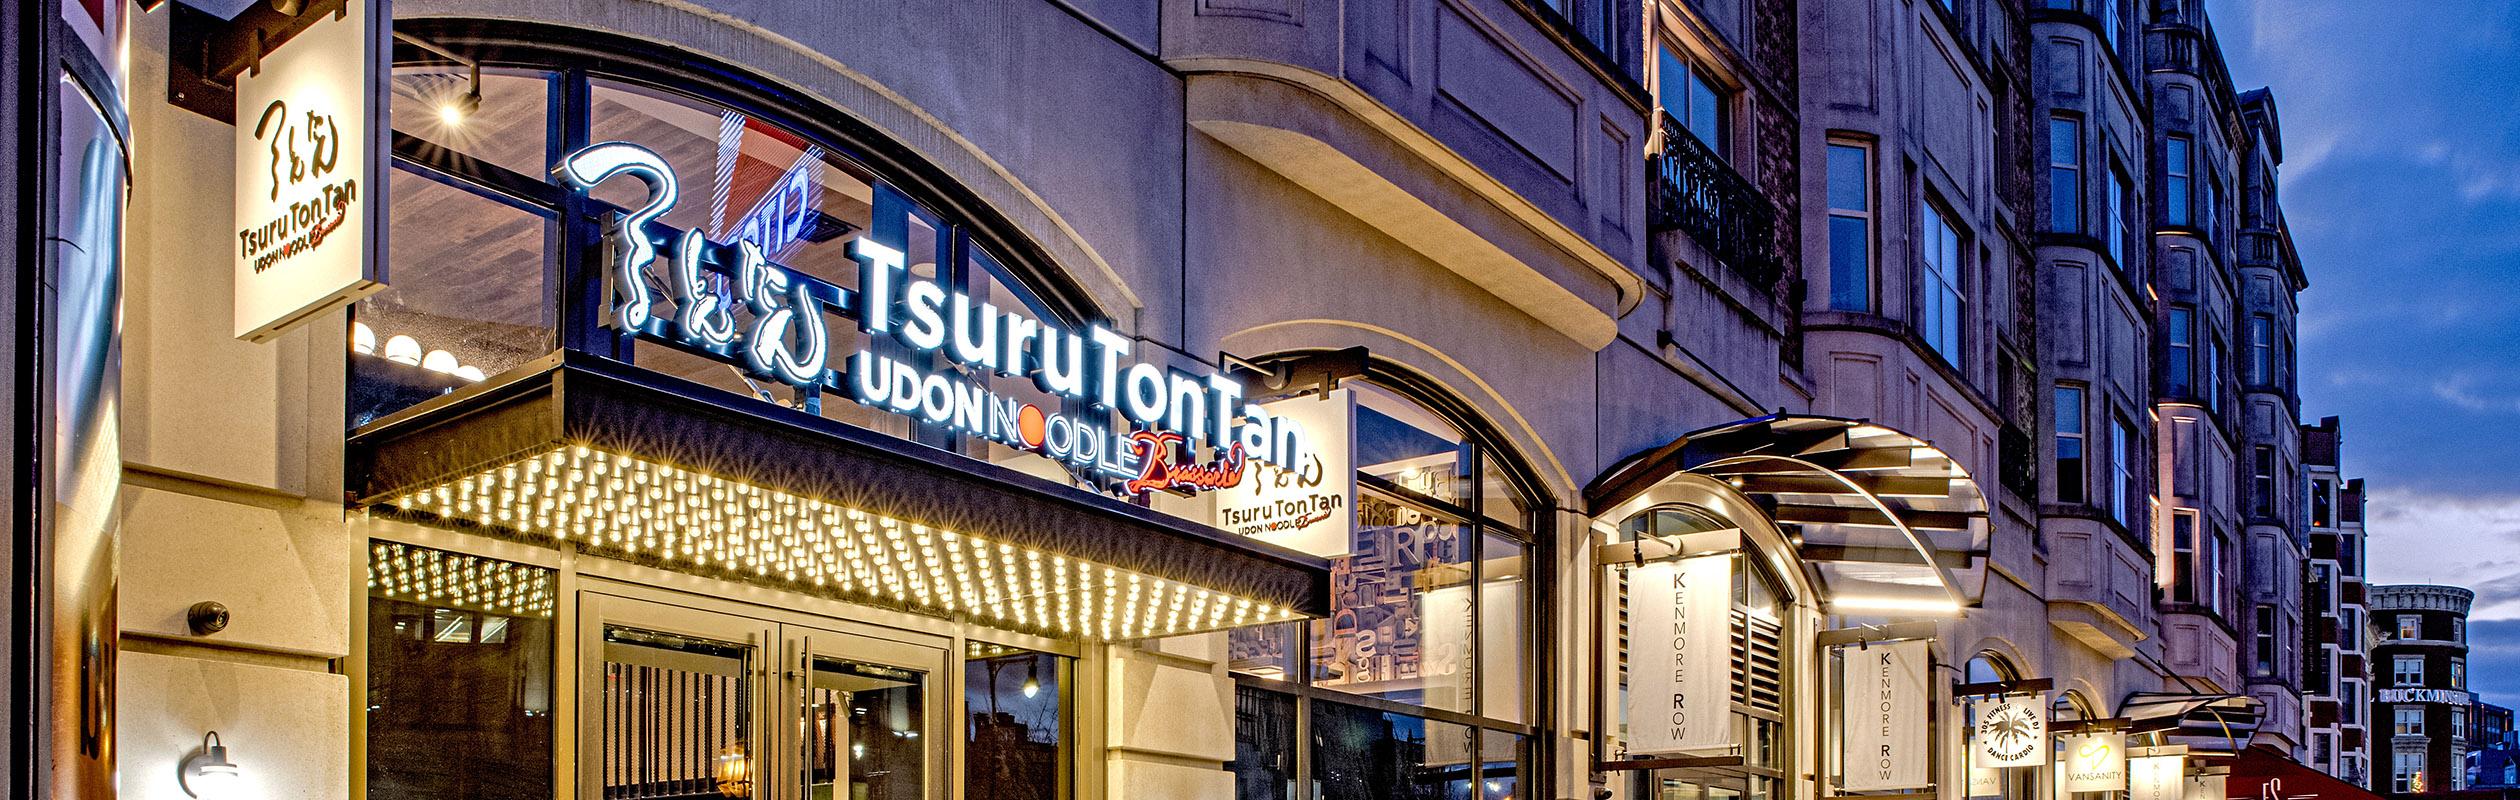 TsuruTonTan UDON NOODLE Brasserie ボストン イメージ写真